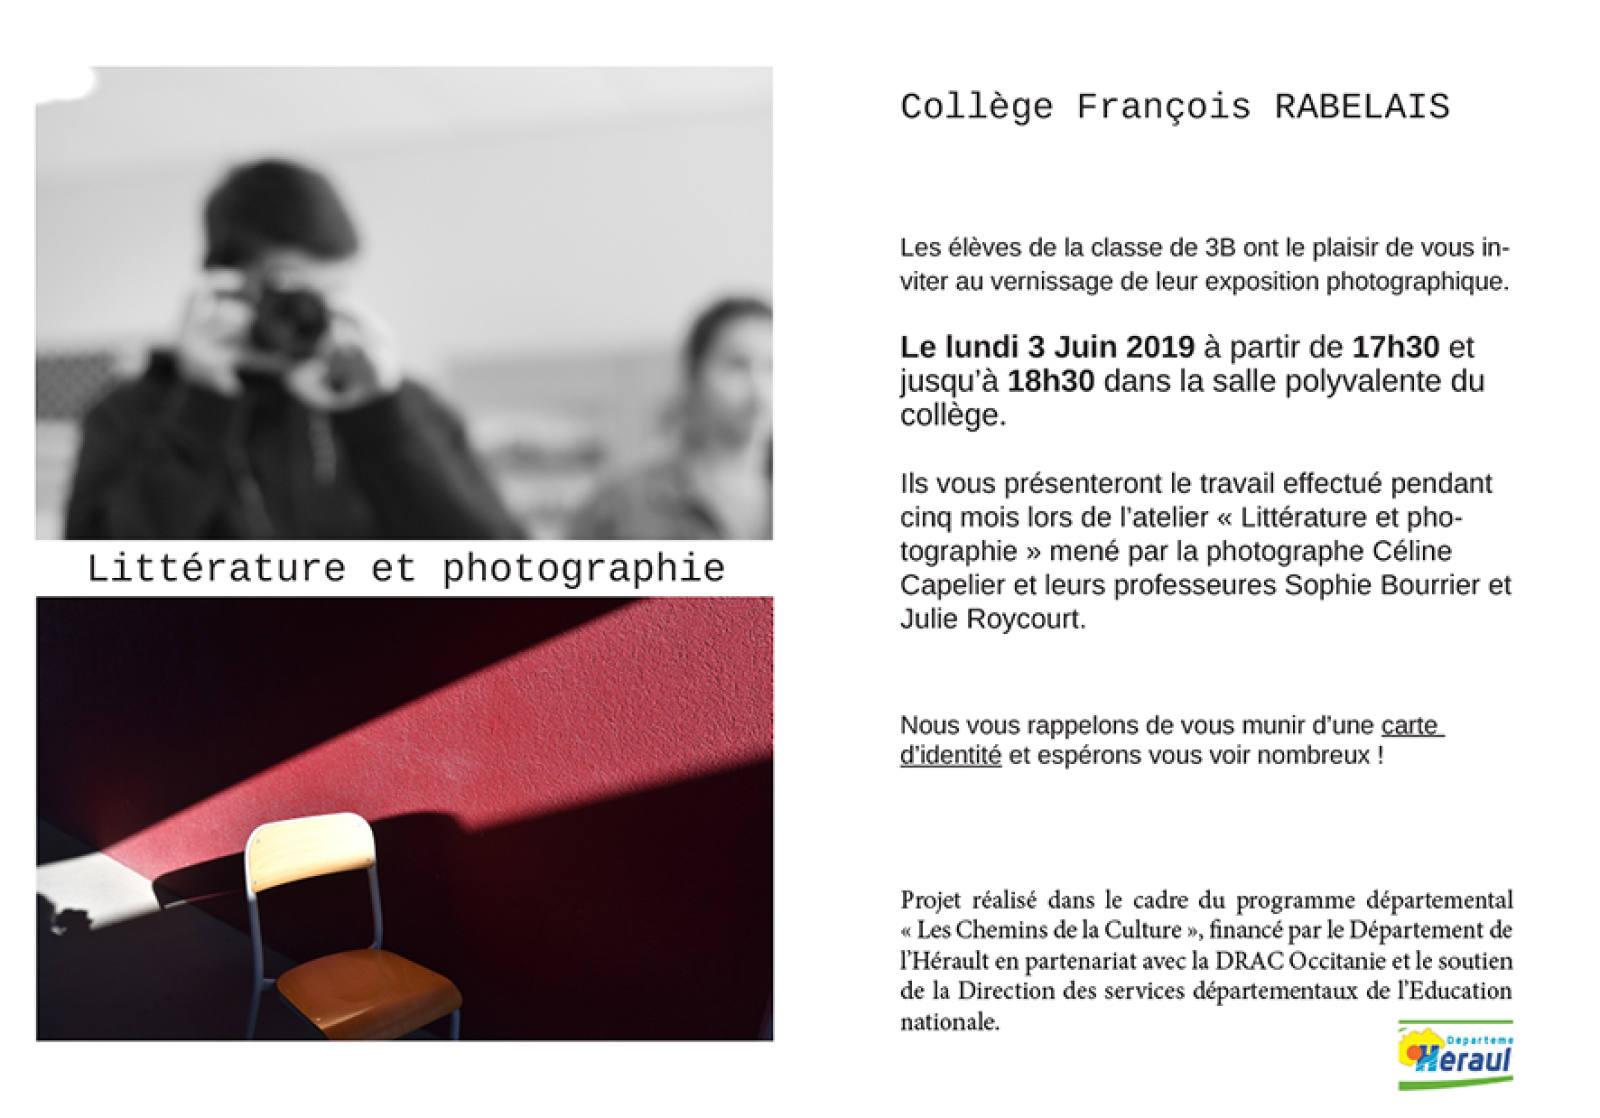 invitation-rabelais2.jpg